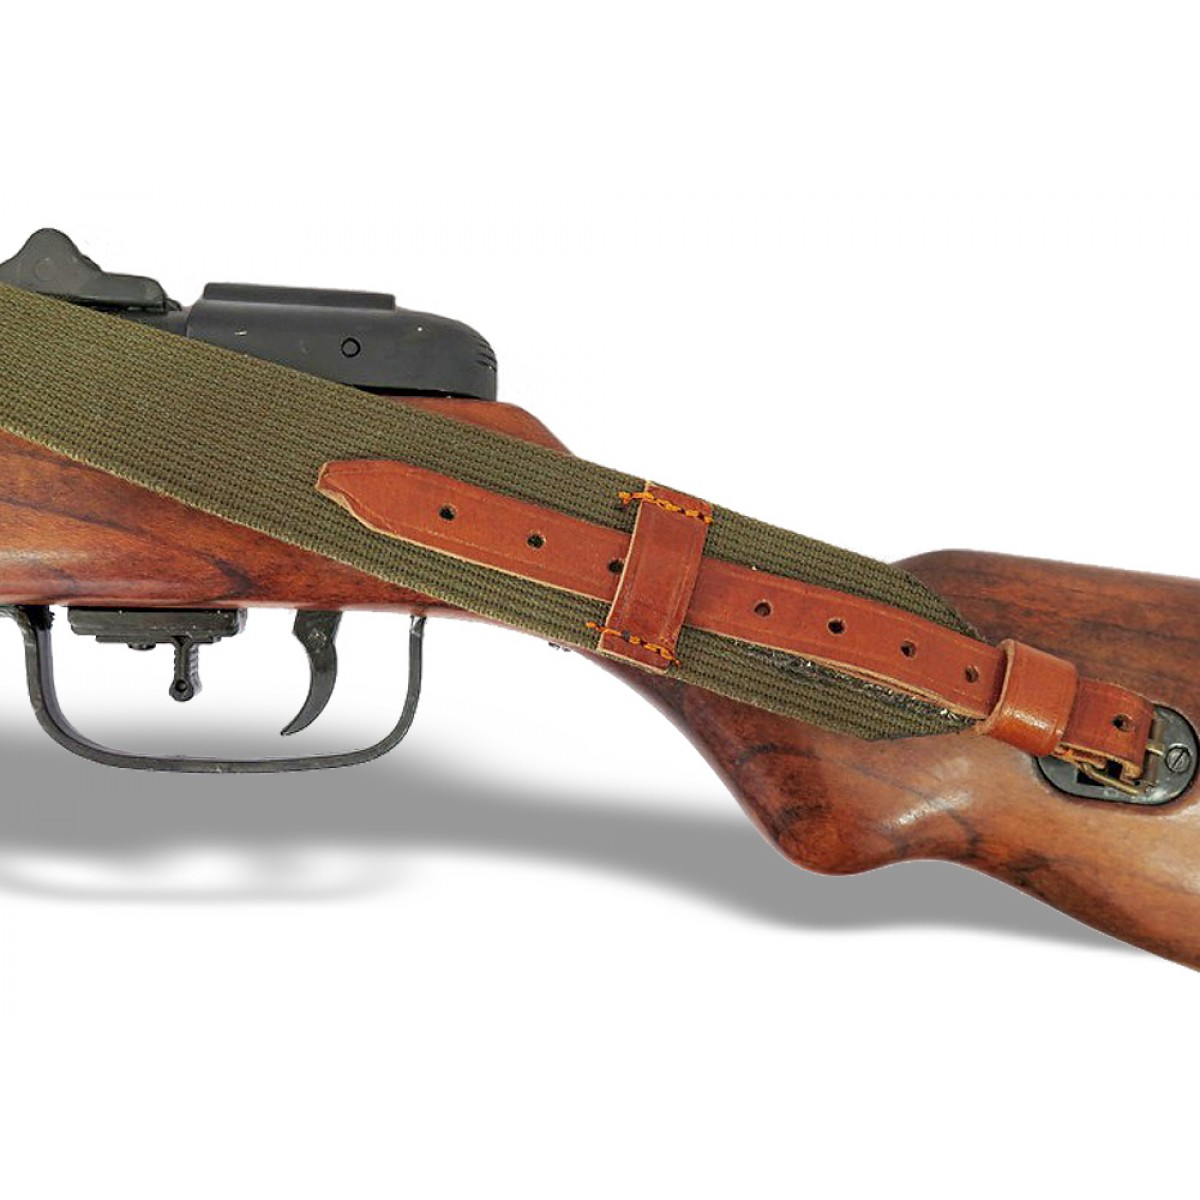 Автомат ППШ (пистолет-пулемёт Шпагина) с ремнём, ММГ копия